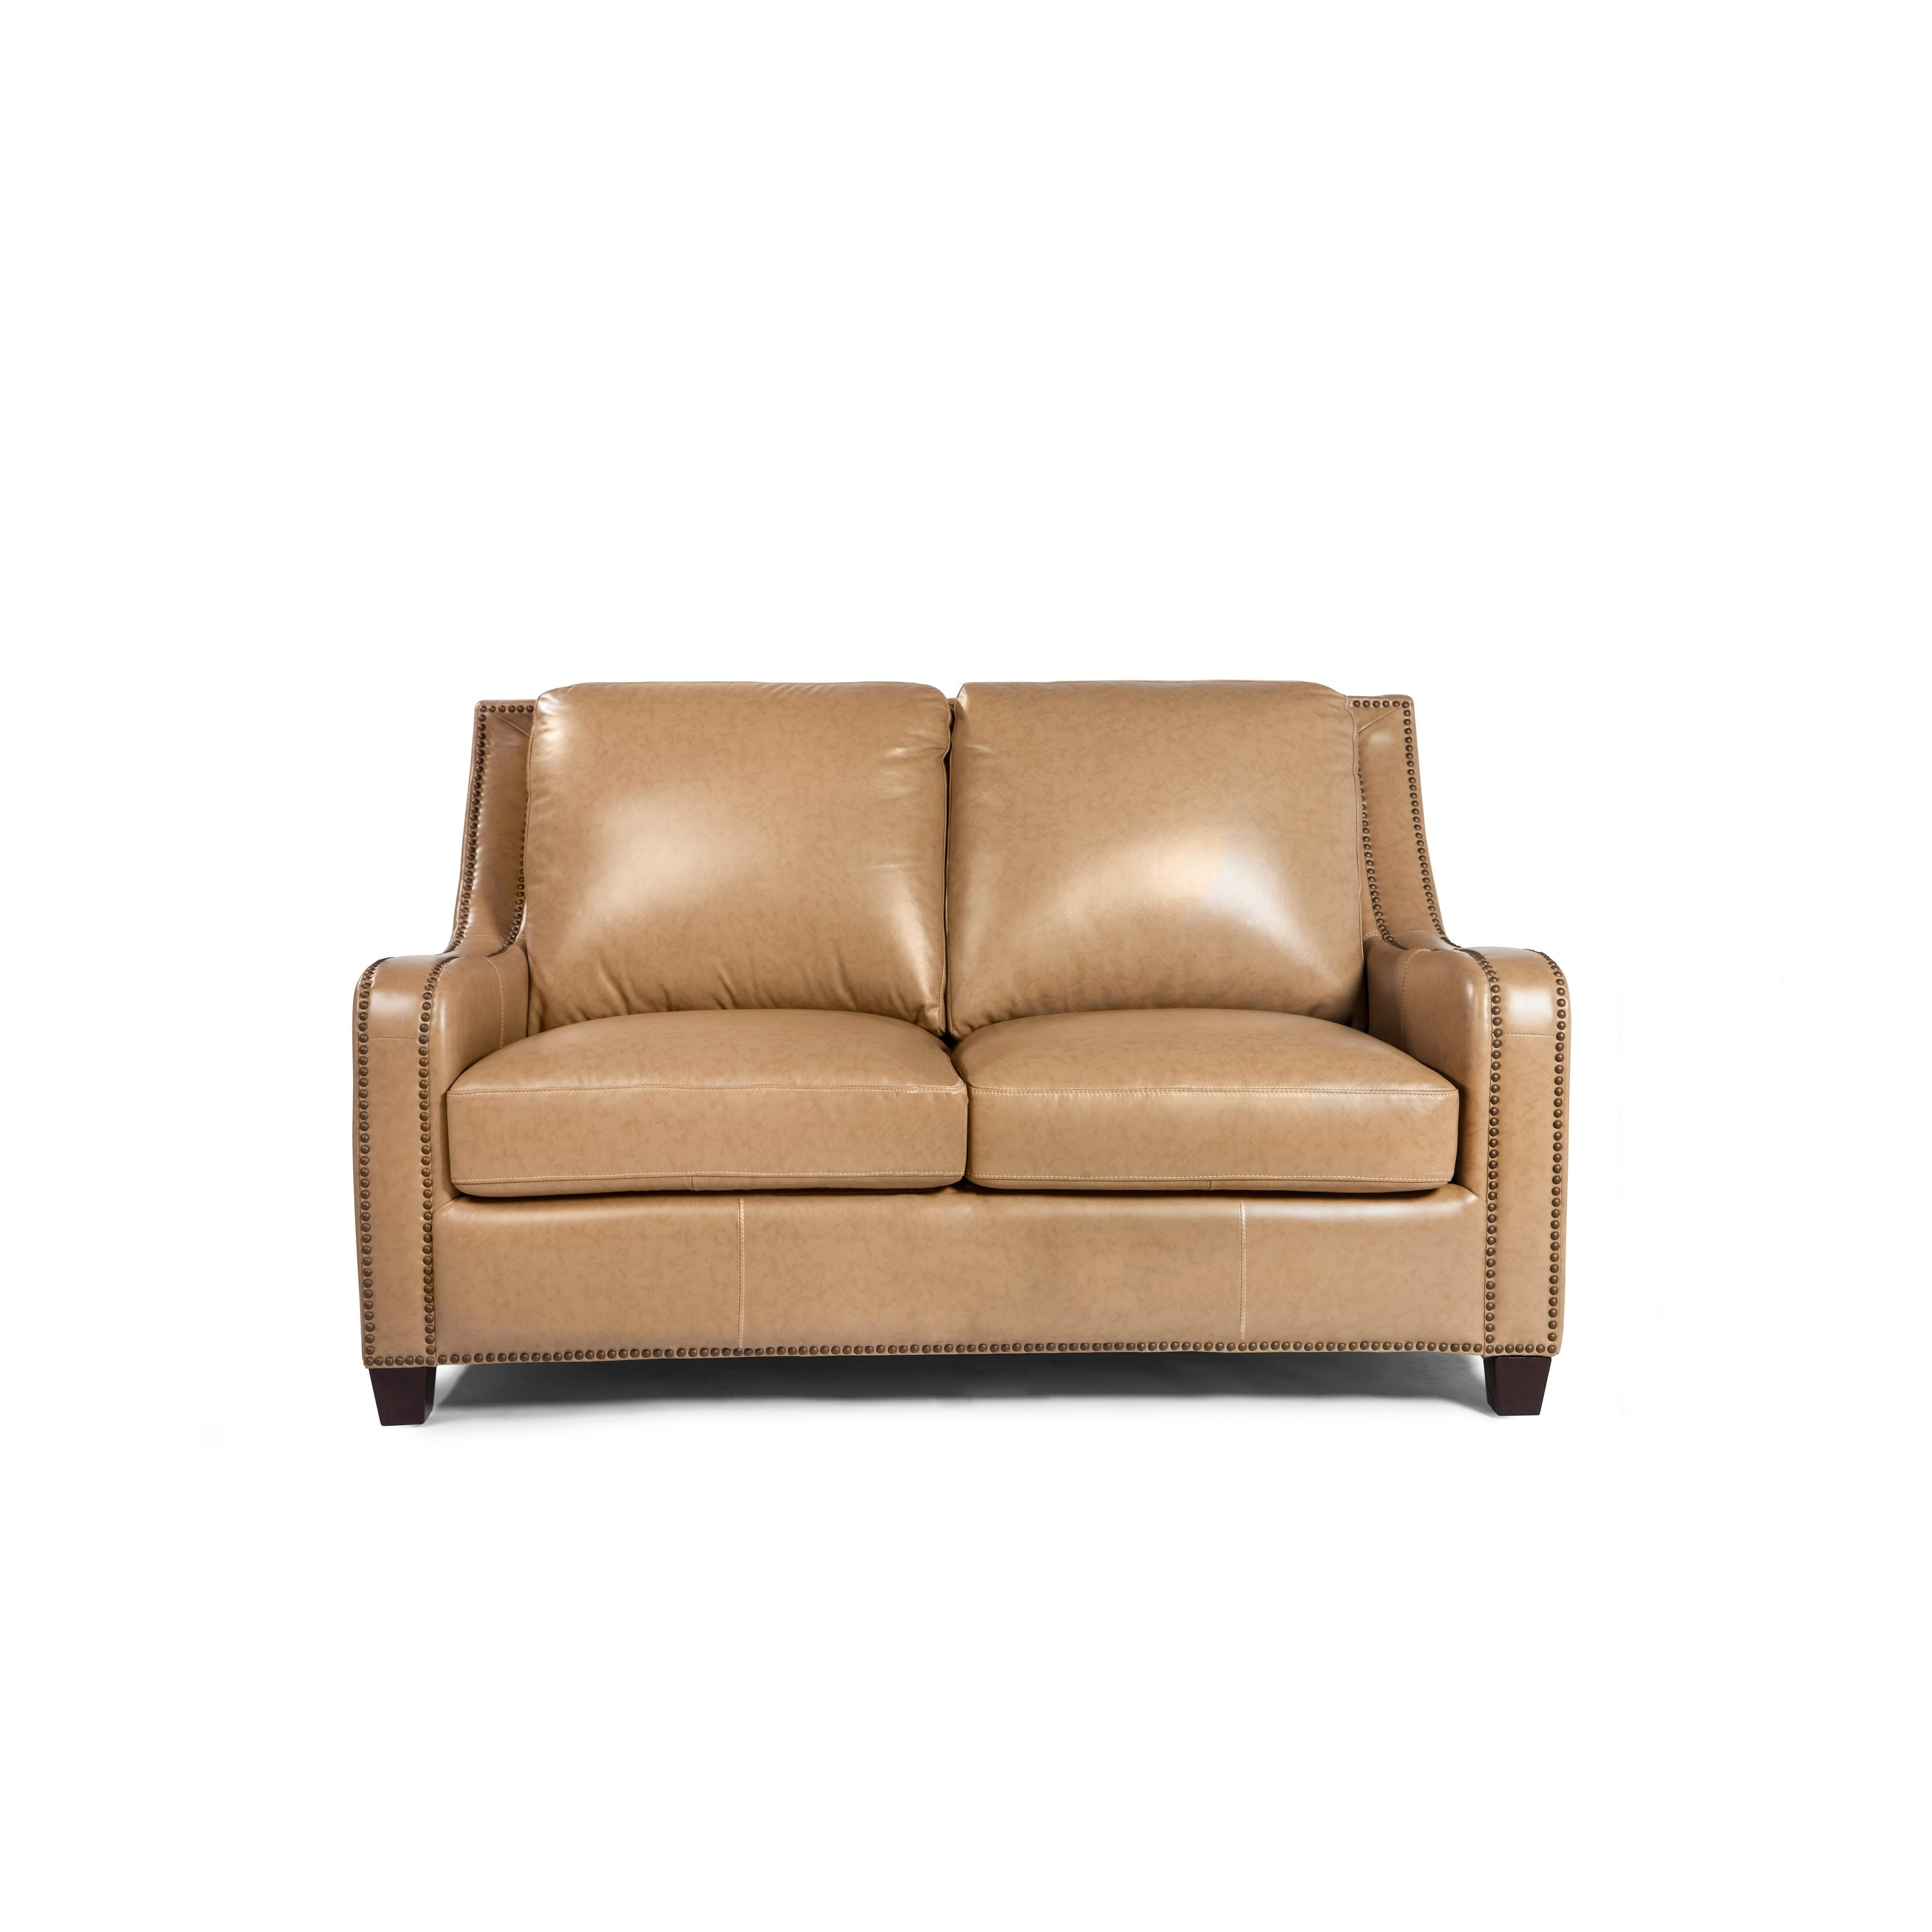 Lazzaro Leather Denver Sofa